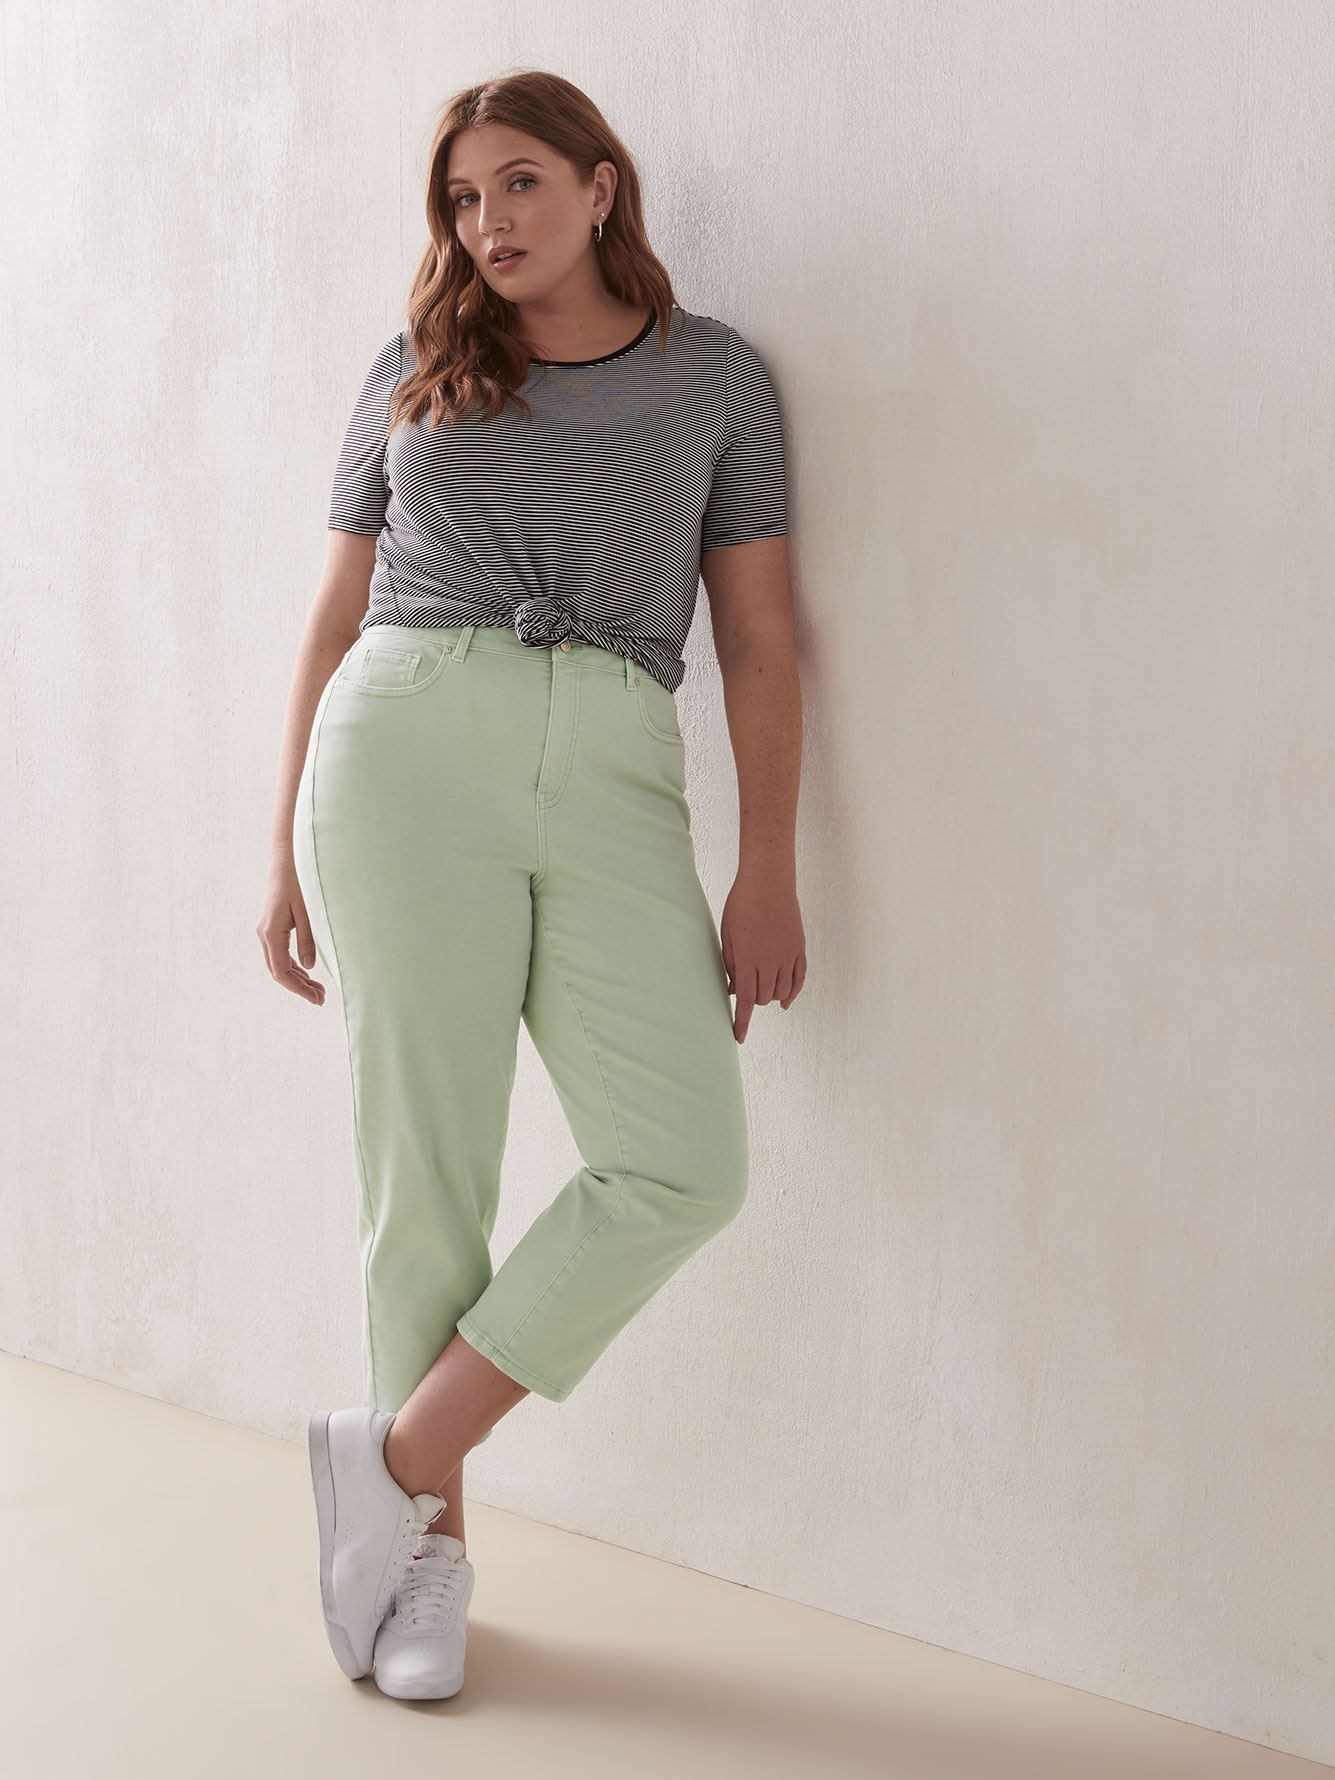 Mid-Rise Cropped Slim Leg Jeans - Addition Elle